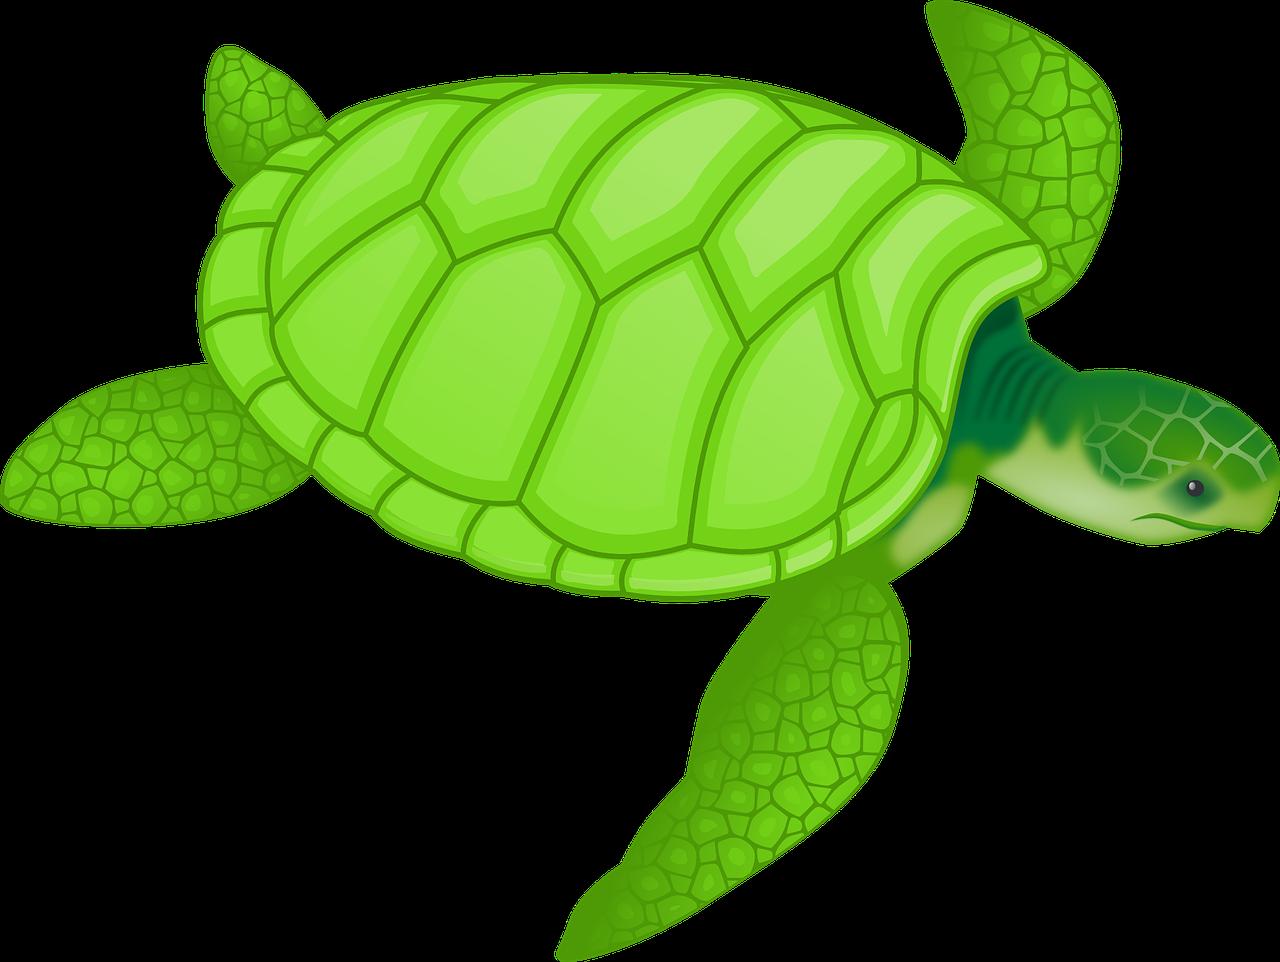 Mat clipart green. Tortoise reptiles turtles transparent